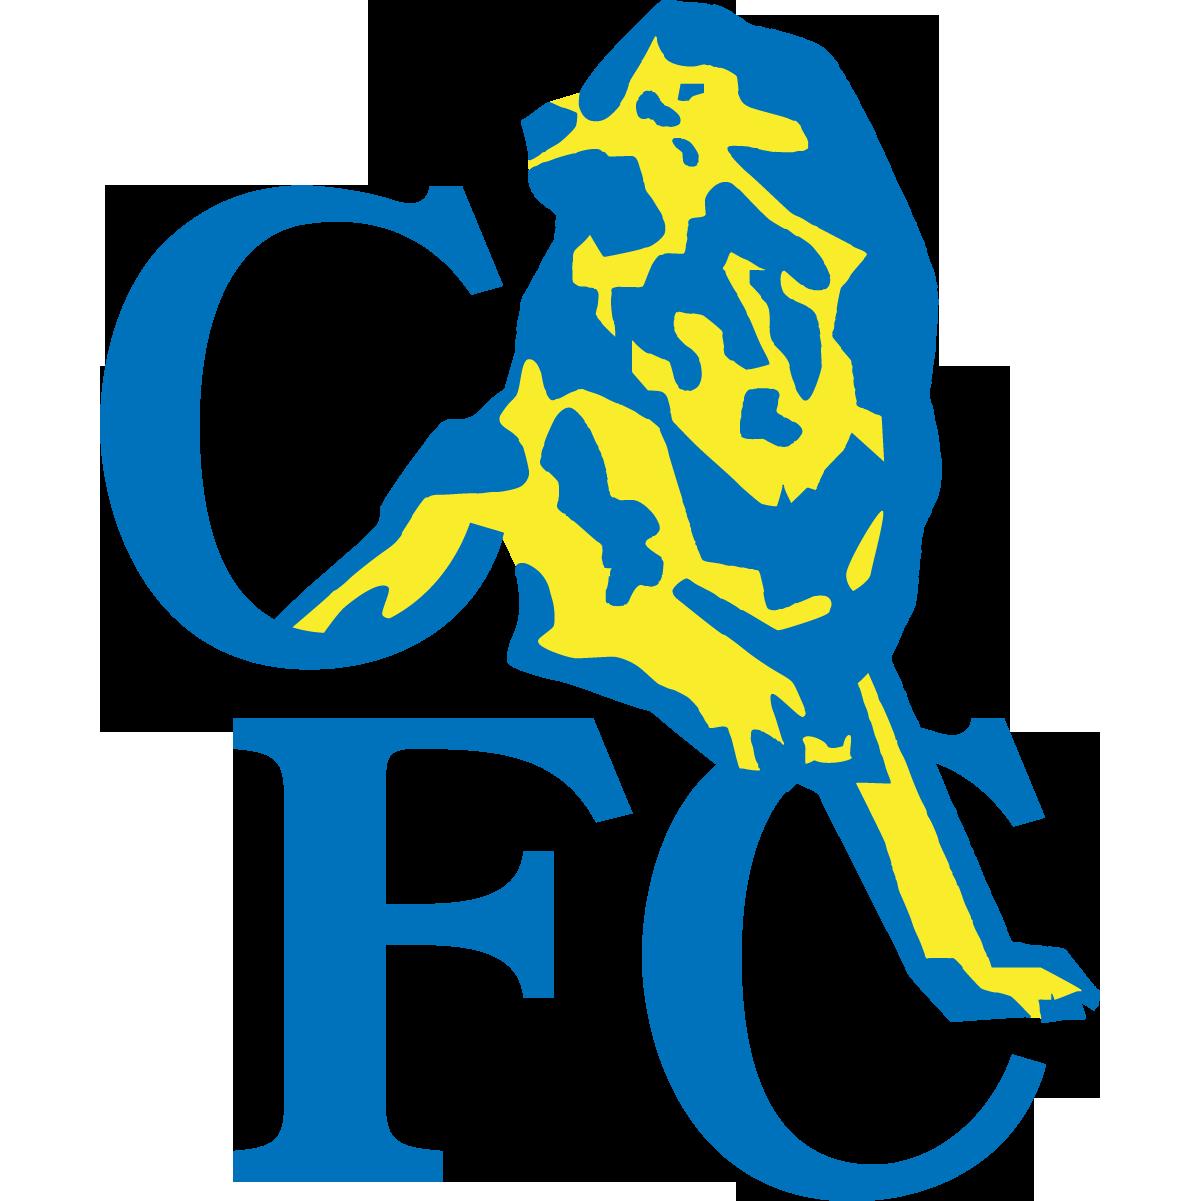 Chelsea fc logopedia fandom powered by wikia 19951997 chelsea fc logo voltagebd Gallery